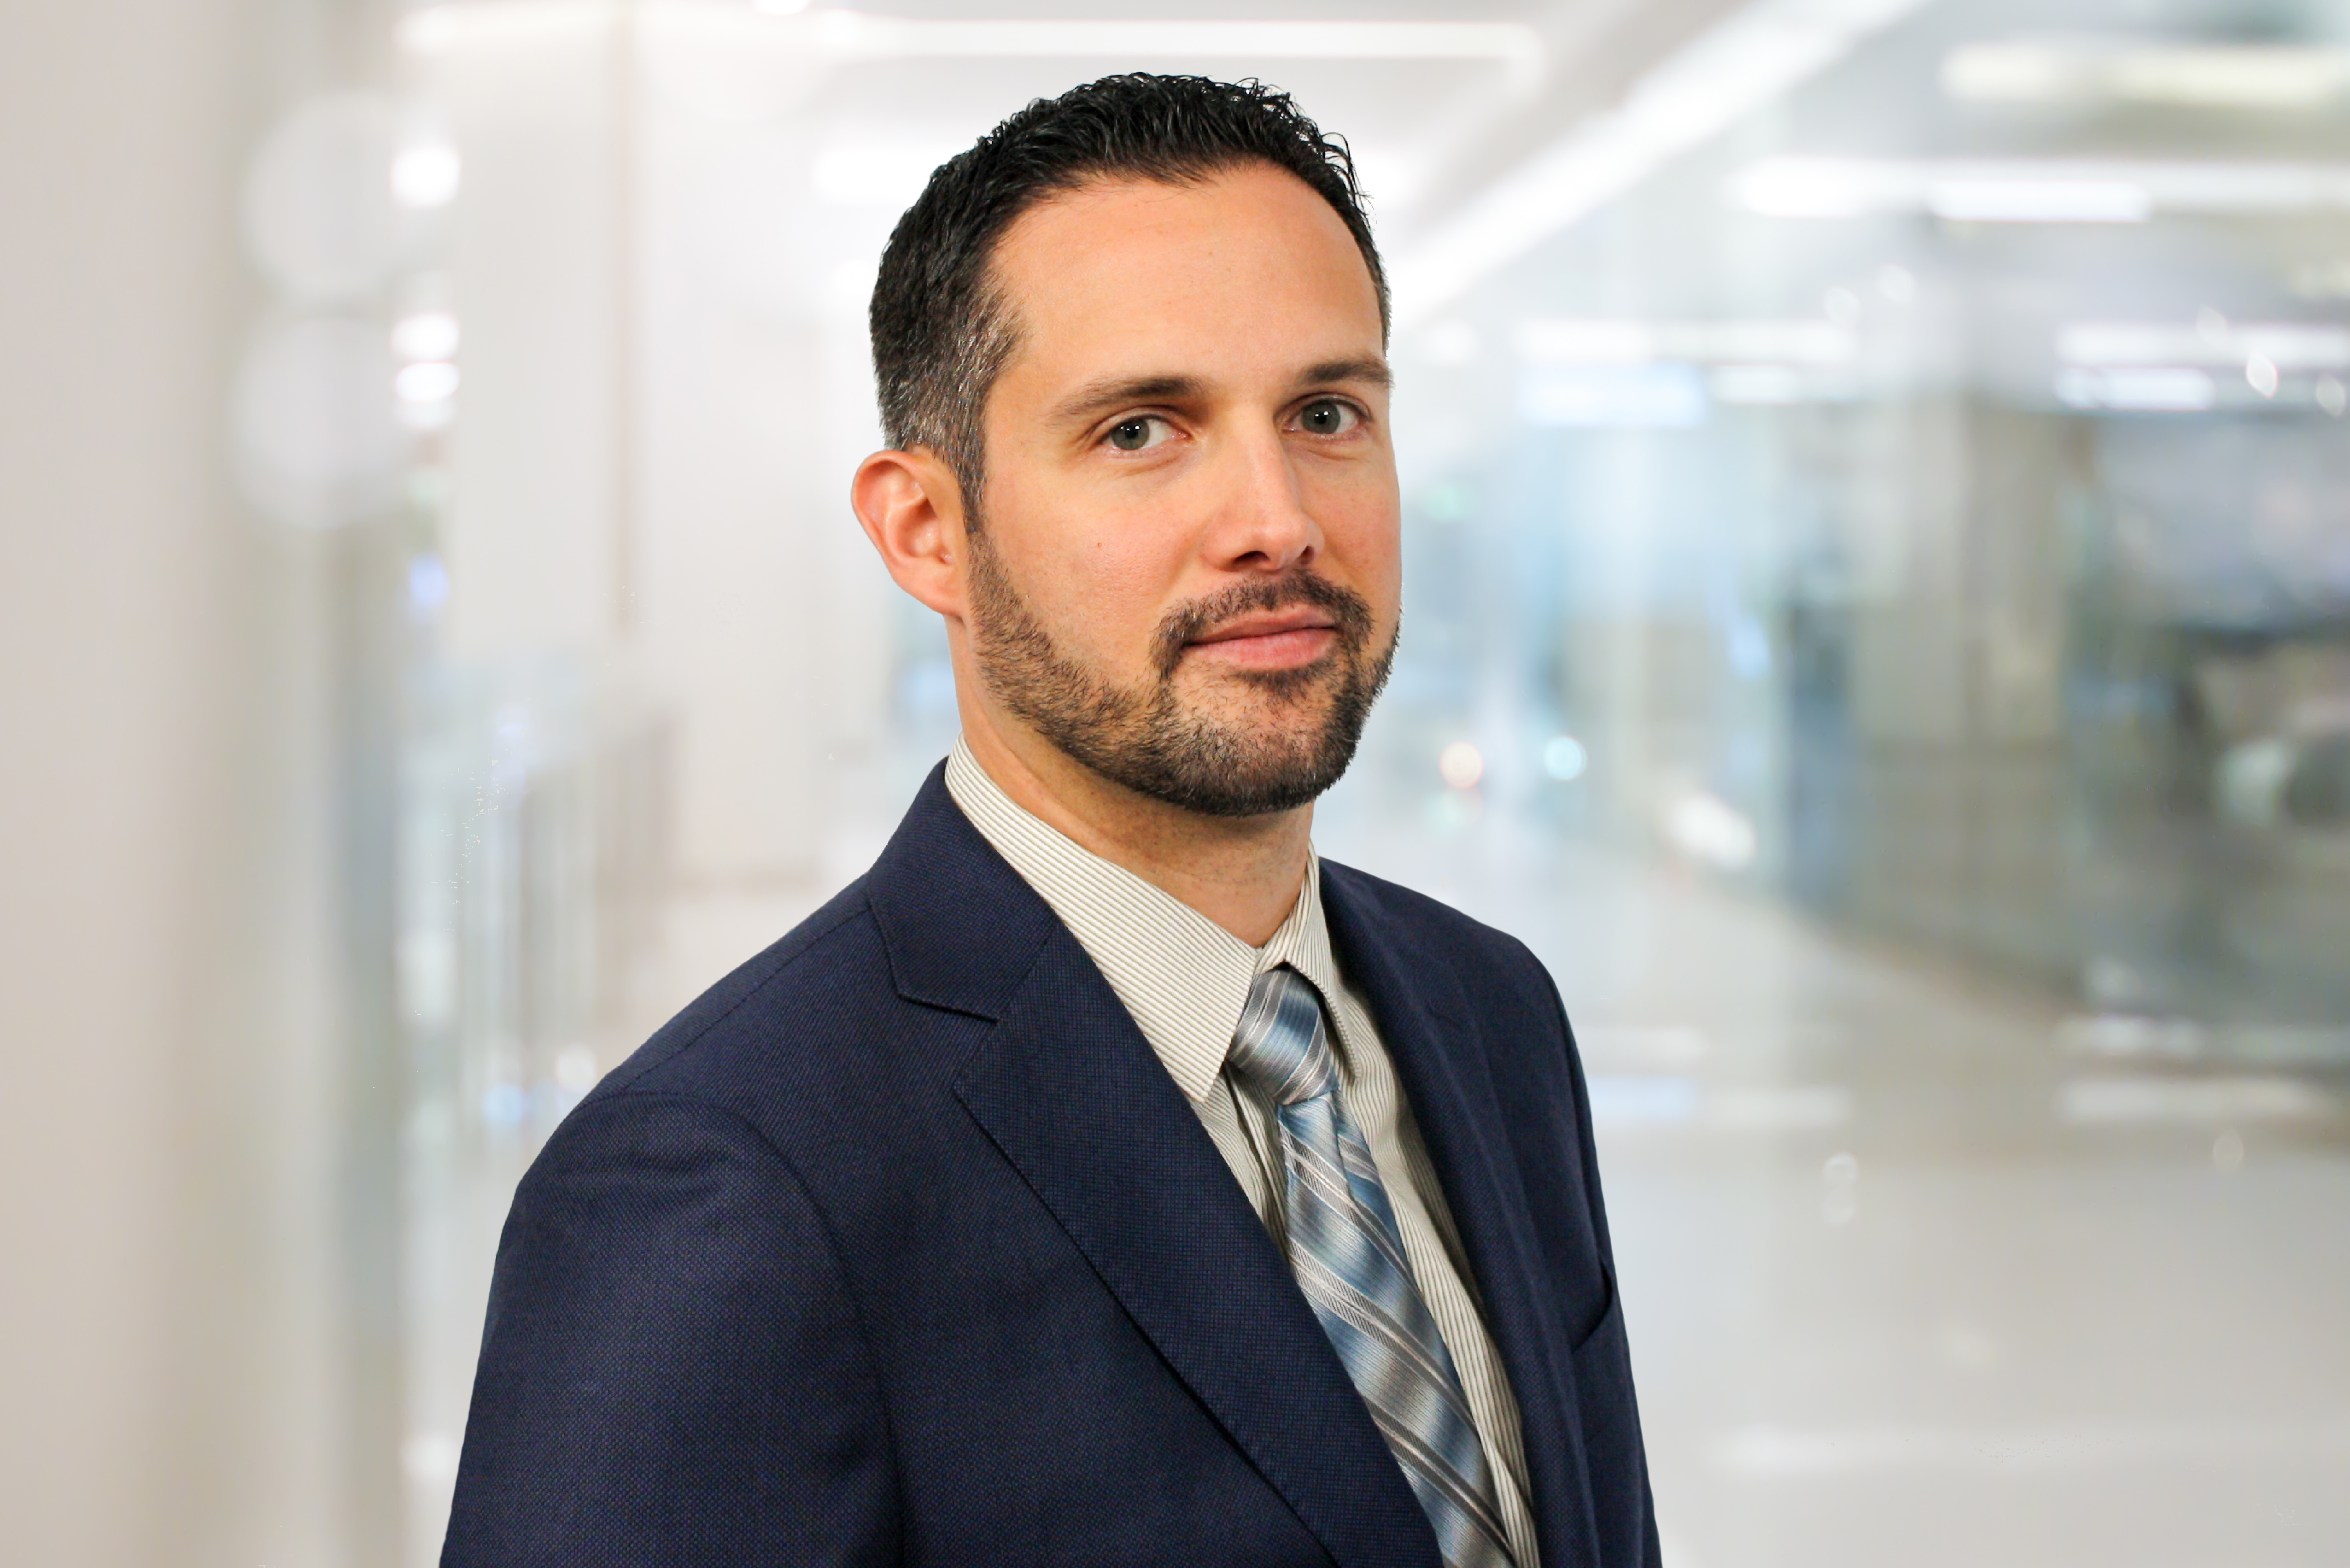 Headshot photo of Eric Assaraf